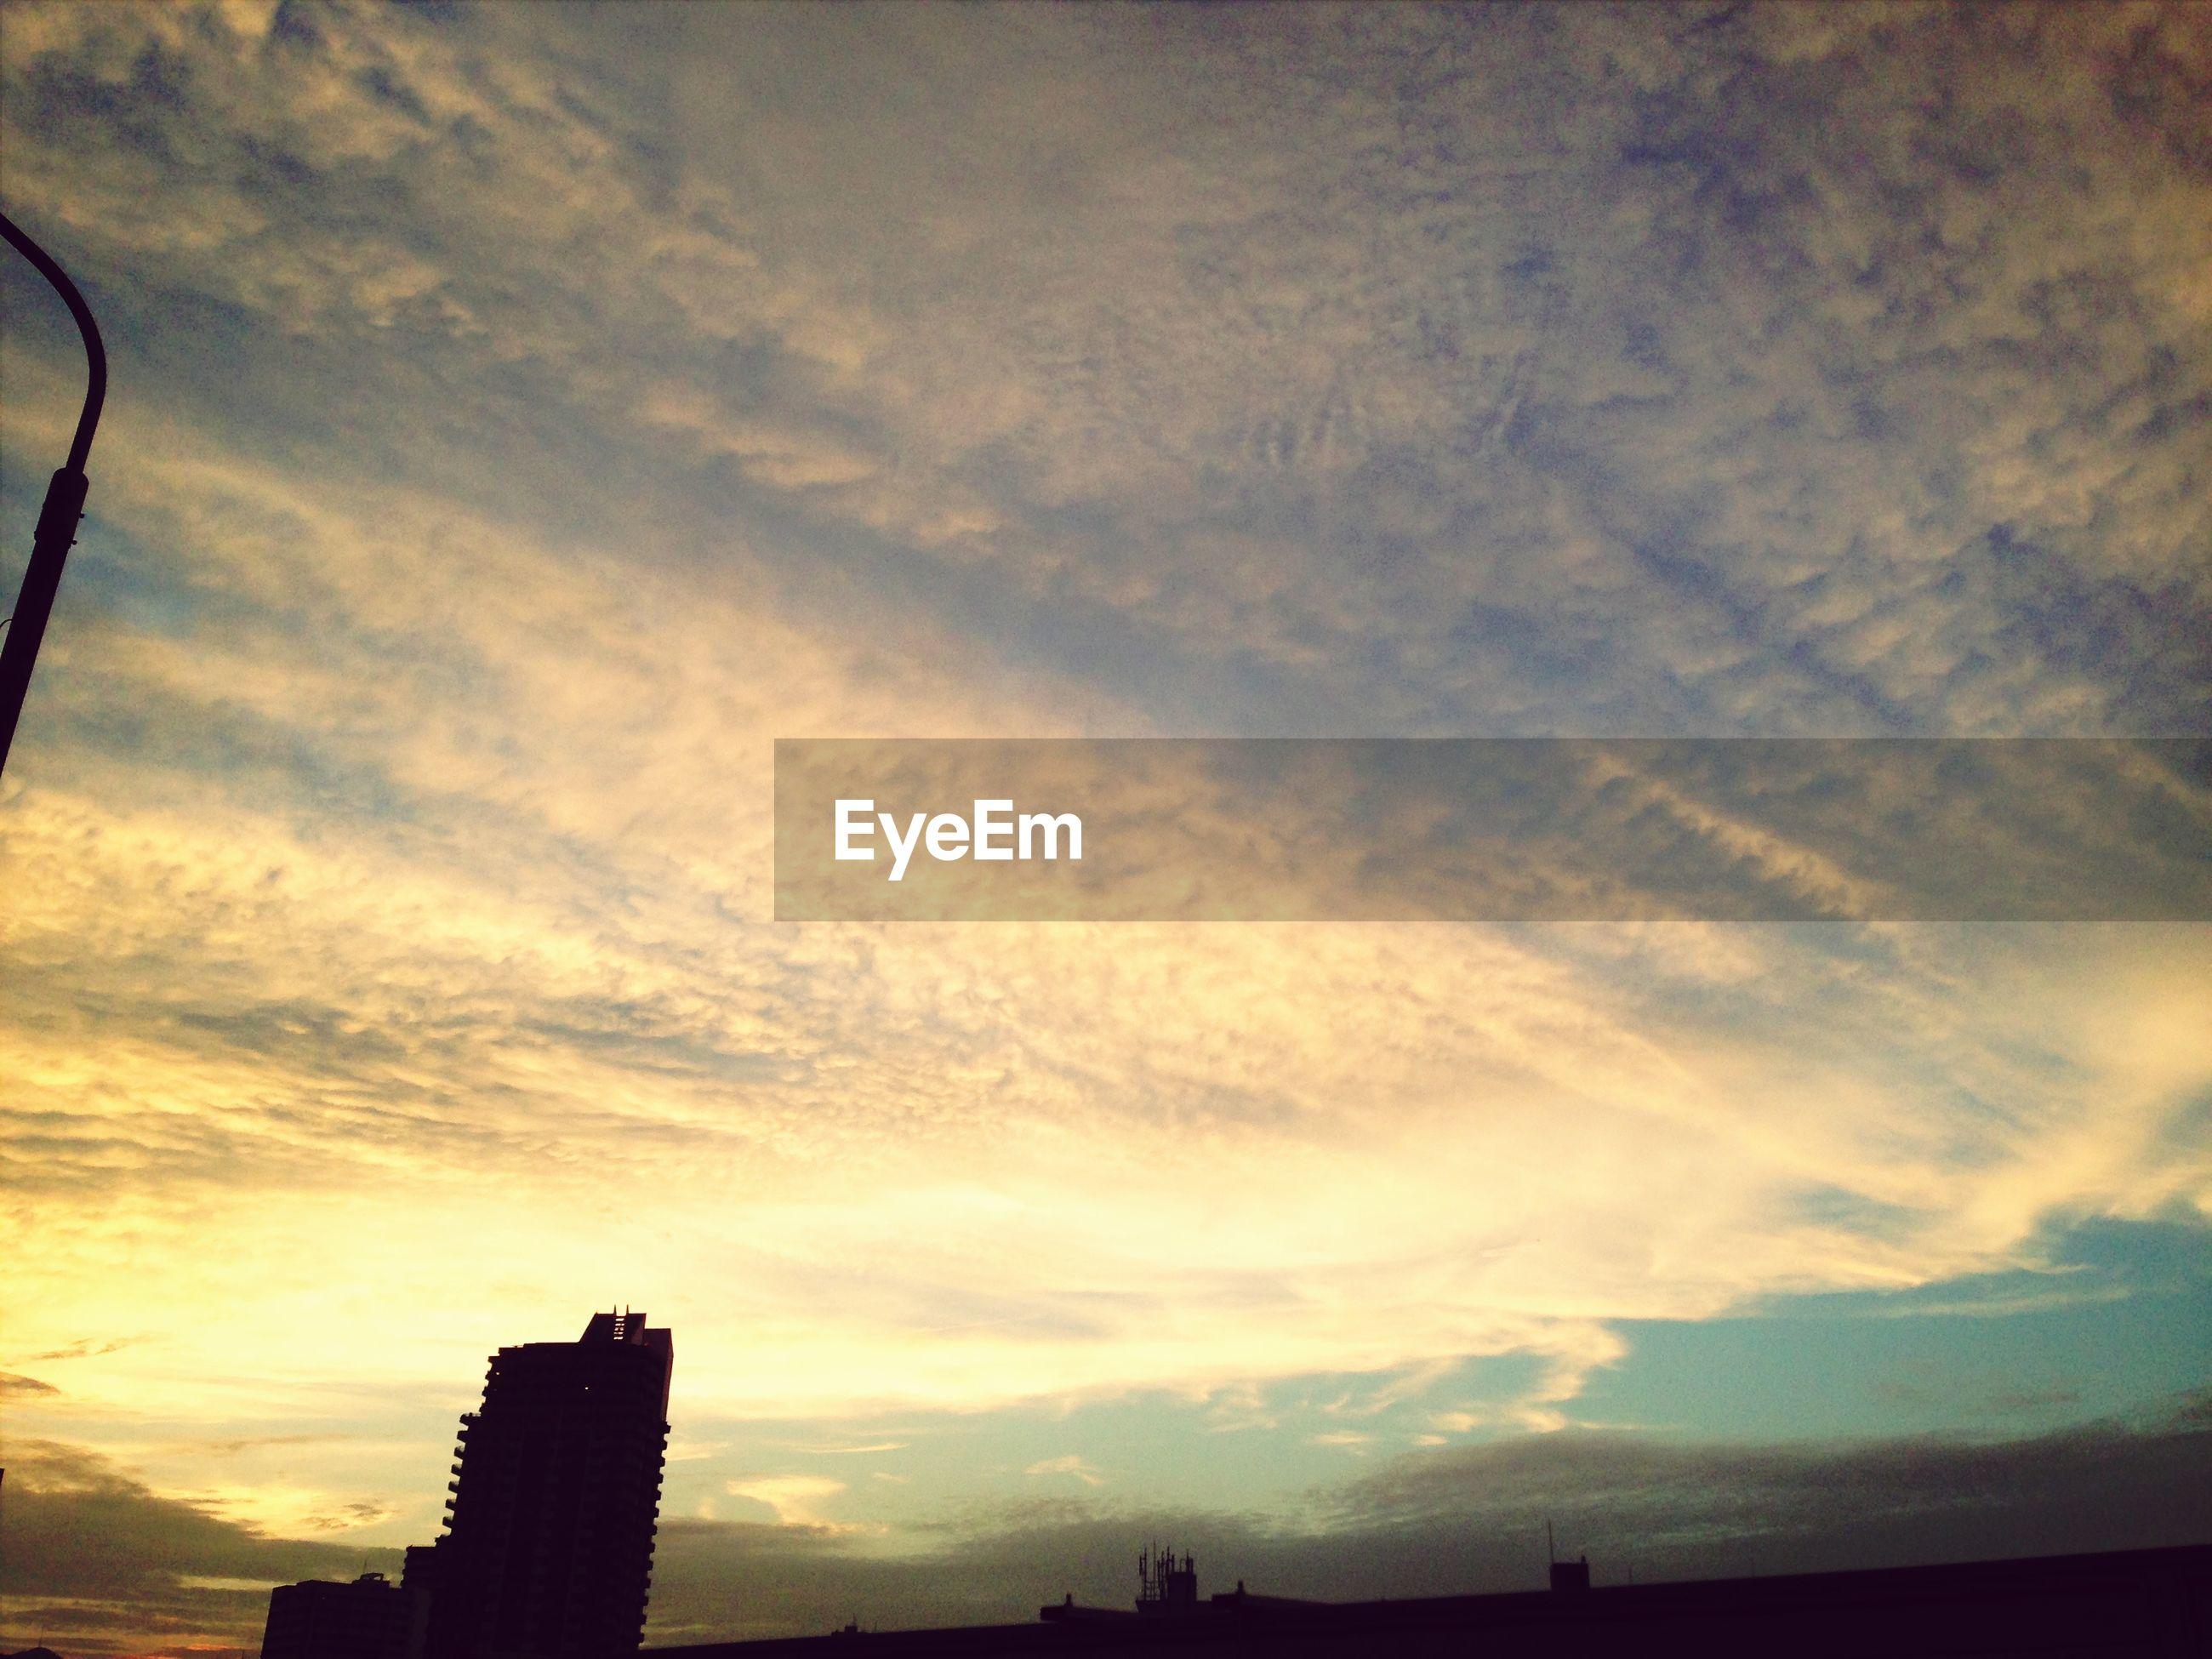 silhouette, sunset, sky, building exterior, built structure, architecture, low angle view, cloud - sky, city, cloud, cloudy, nature, building, beauty in nature, outdoors, outline, no people, orange color, scenics, dusk